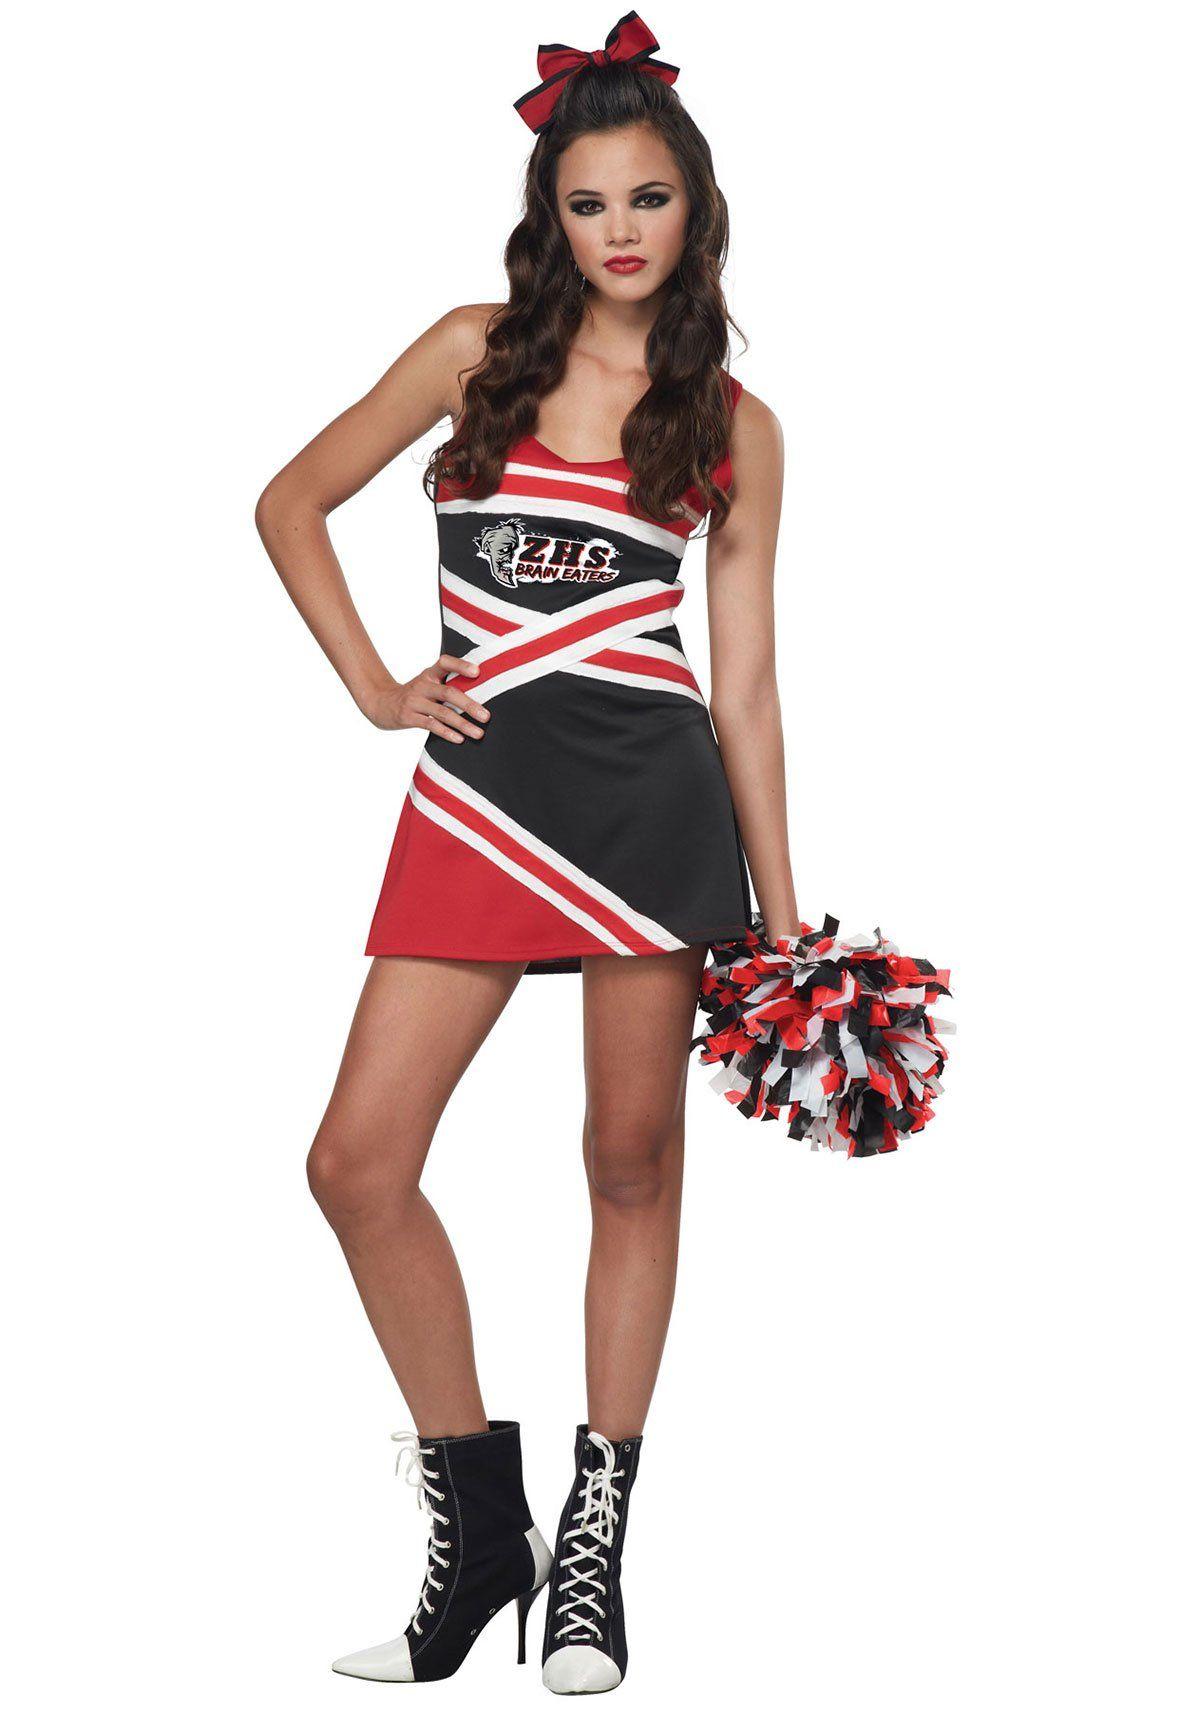 Diy Halloween Costumes For Girls Age 11 13.Teen Cheerleader Costume Junior 7 9 Costumes